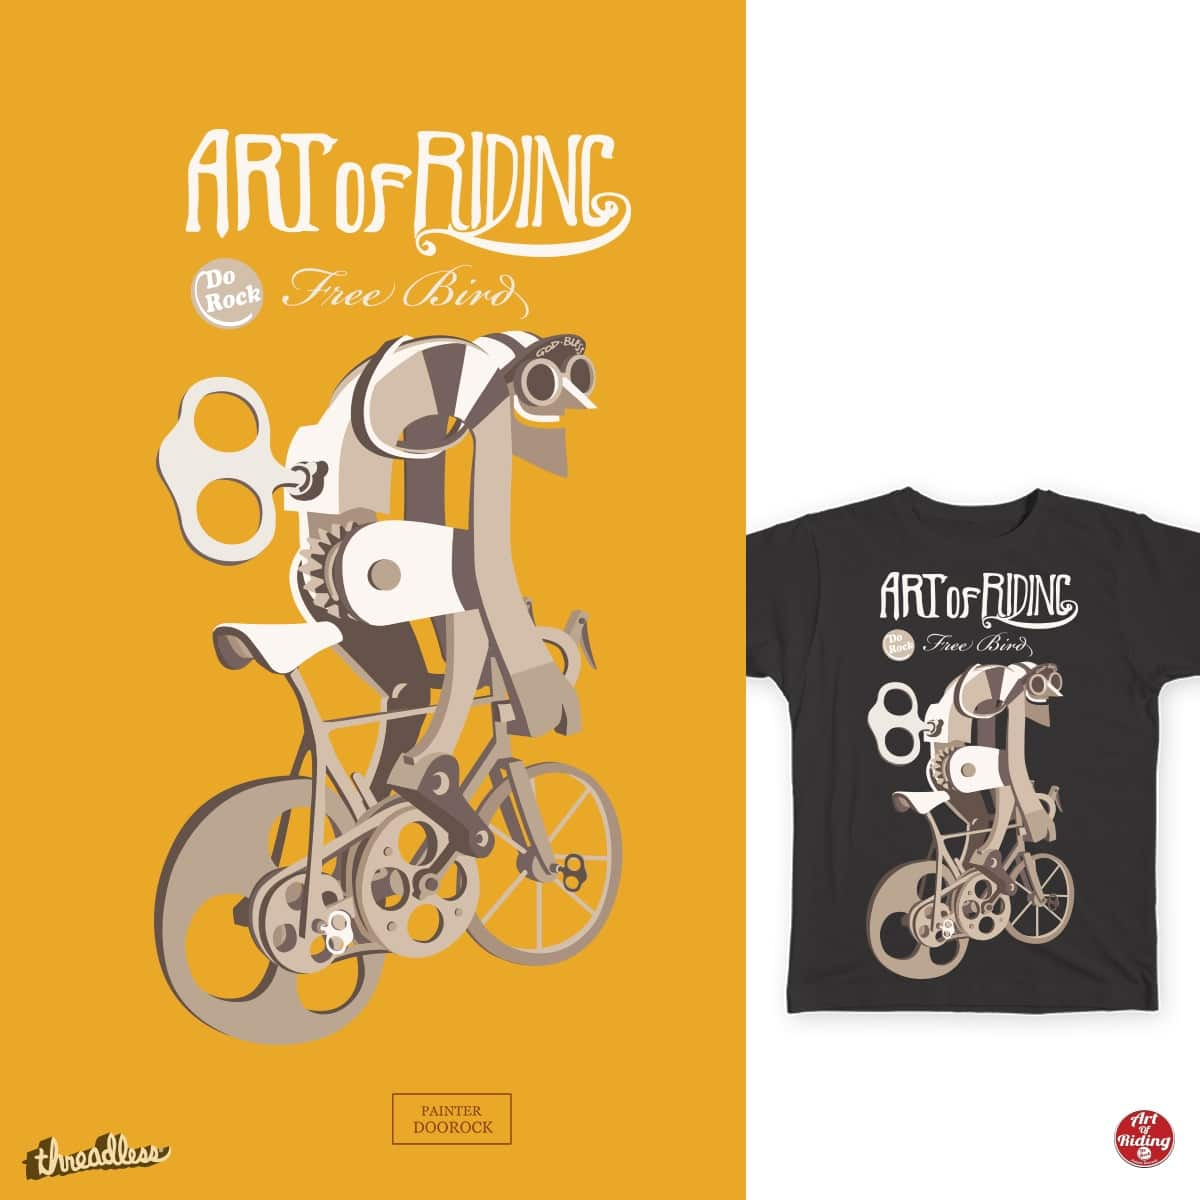 The 1913 Tour de France by doorocky on Threadless